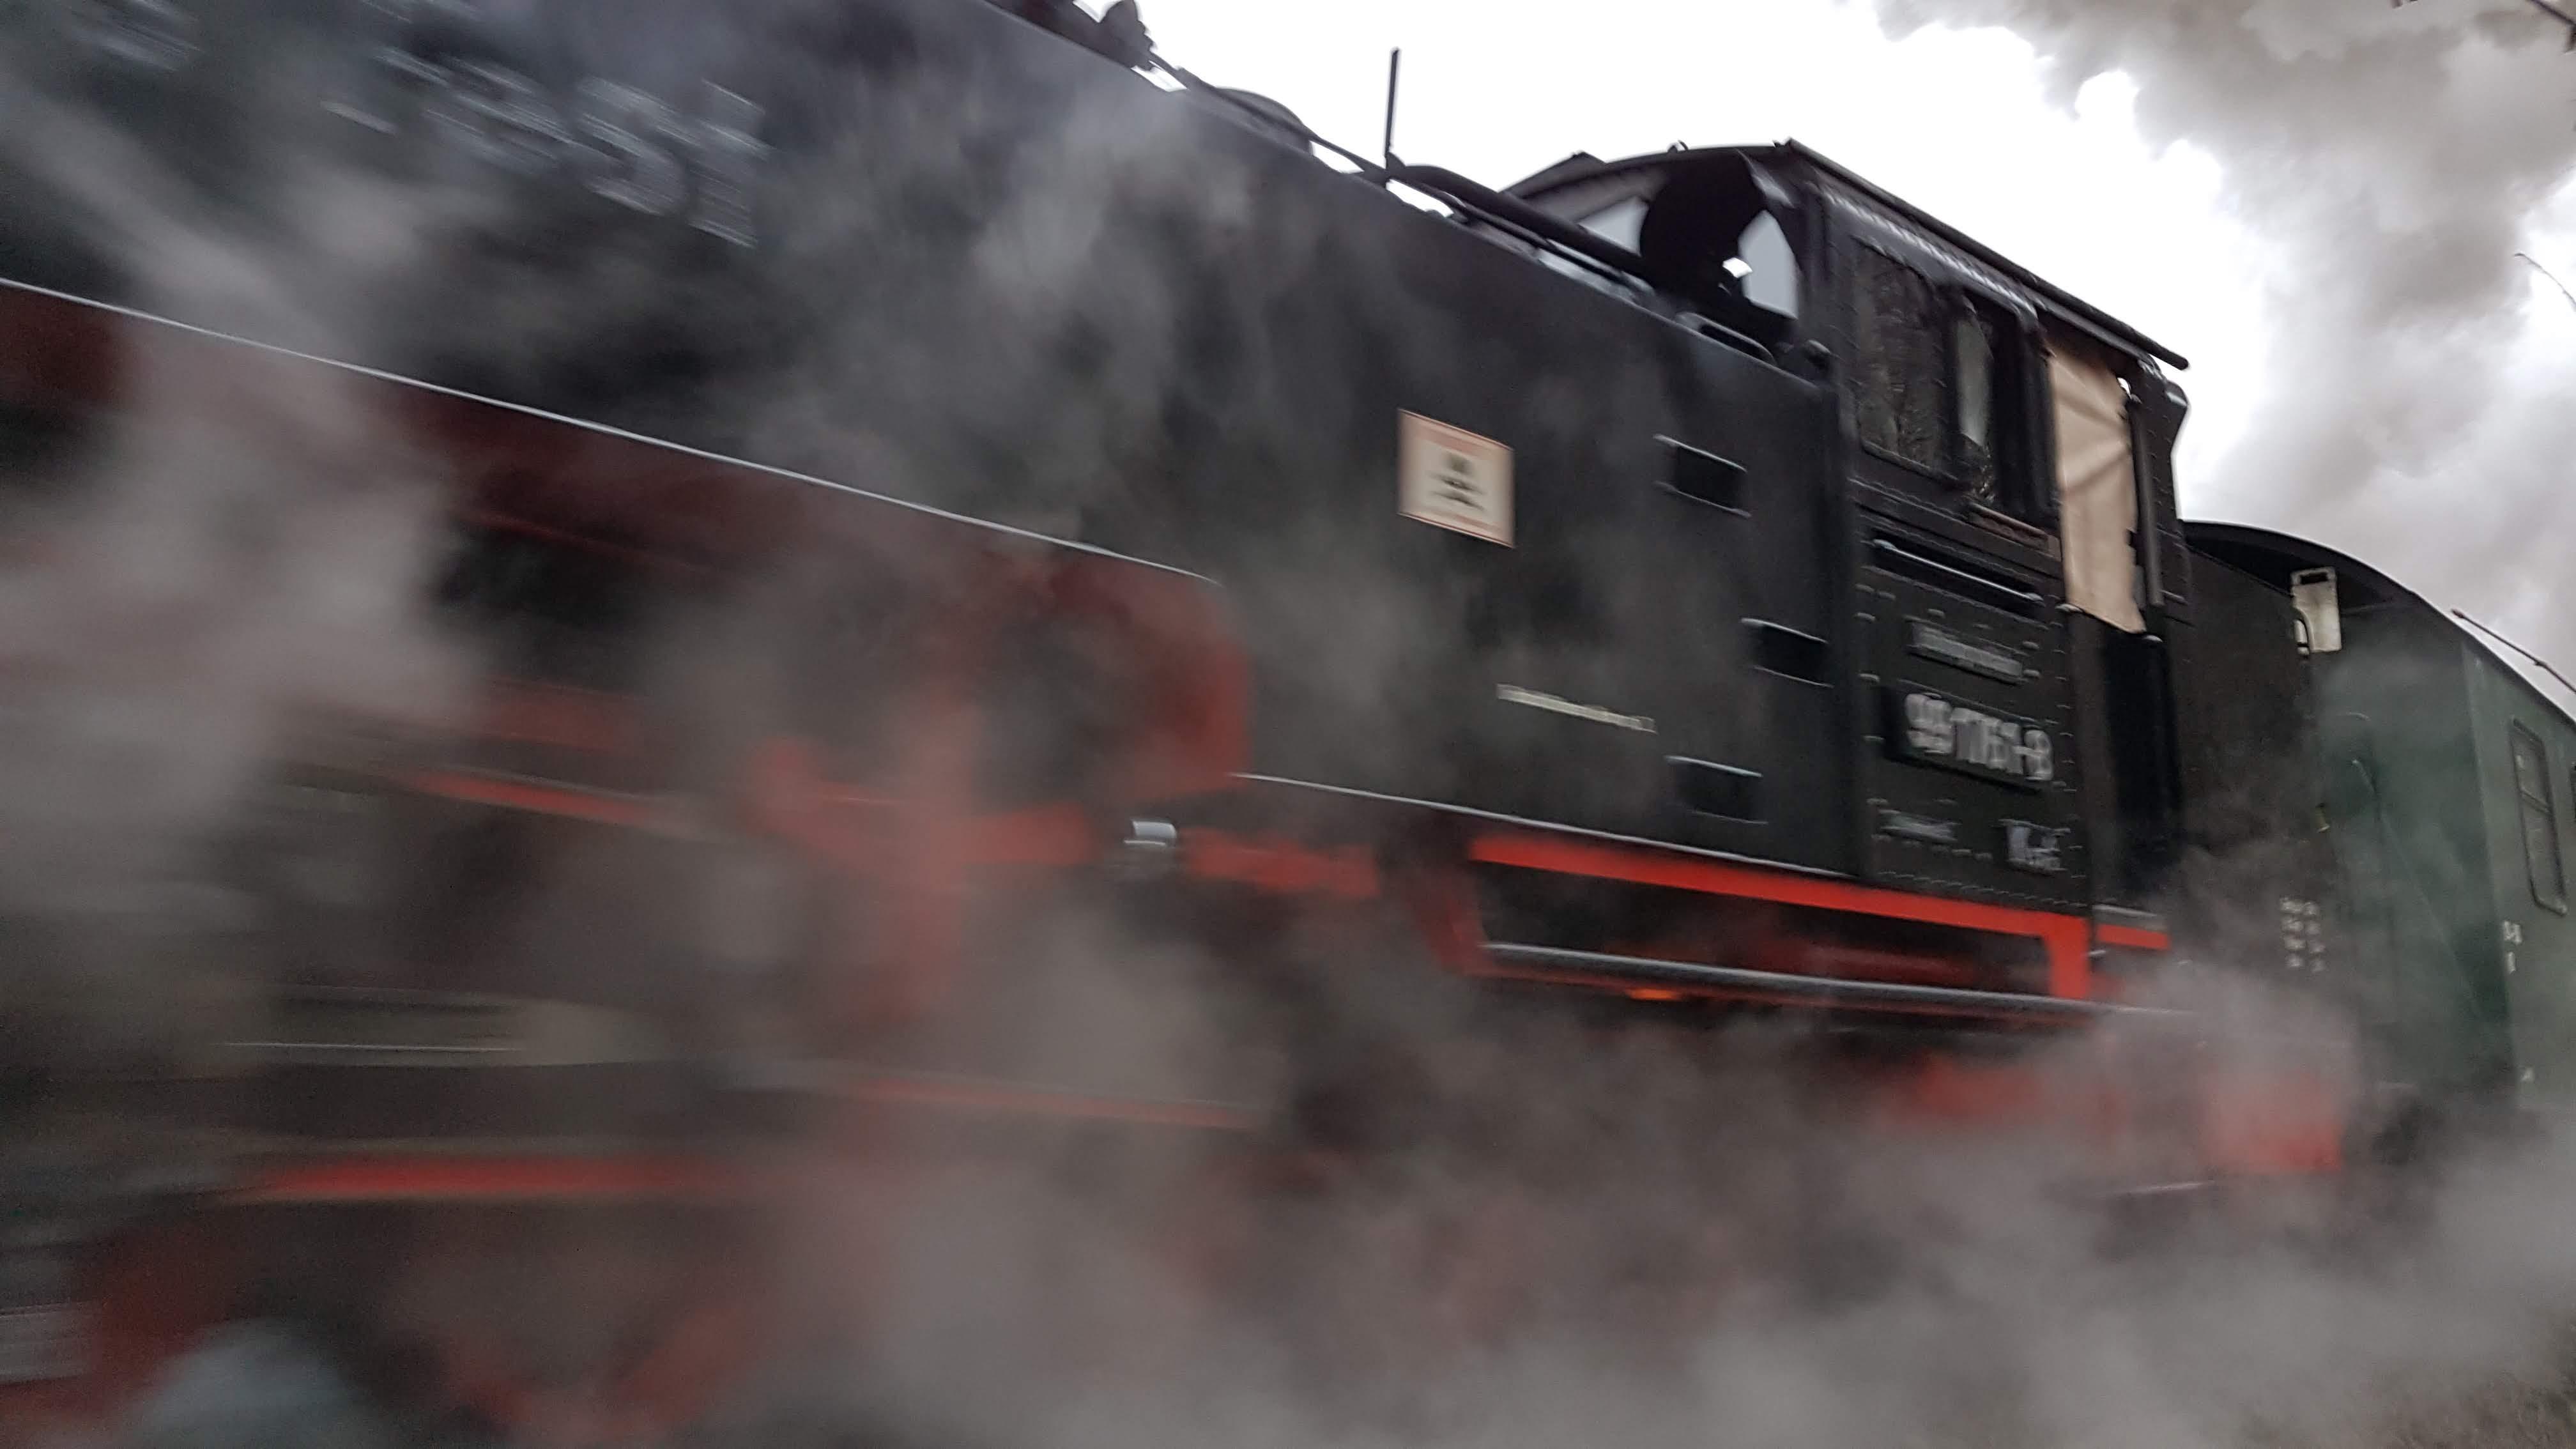 Dampflok in voller Fahrt